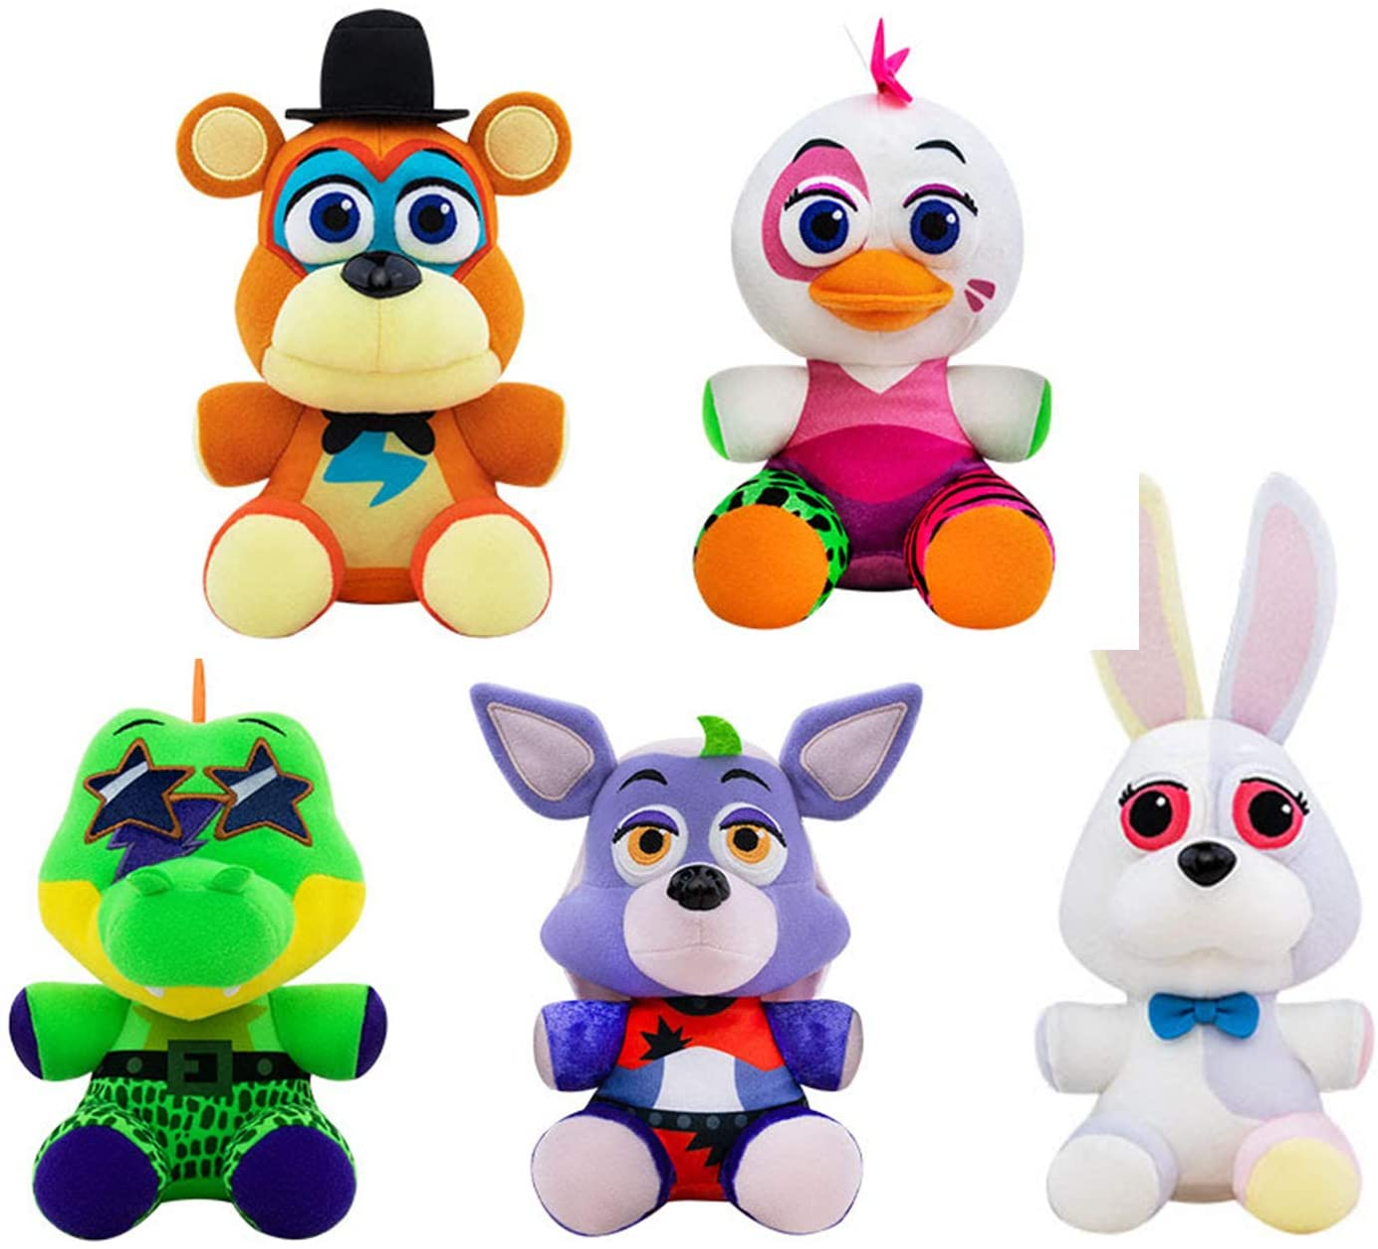 Koala Stuffed Animals Mini, Amazon Com Five Nights At Freddy Fnaf Security Breach Plush Set Of 5 Glamrock Freddy Glamrock Chica Montgomery Gator Roxanne Wolf And Vannie Toys Games